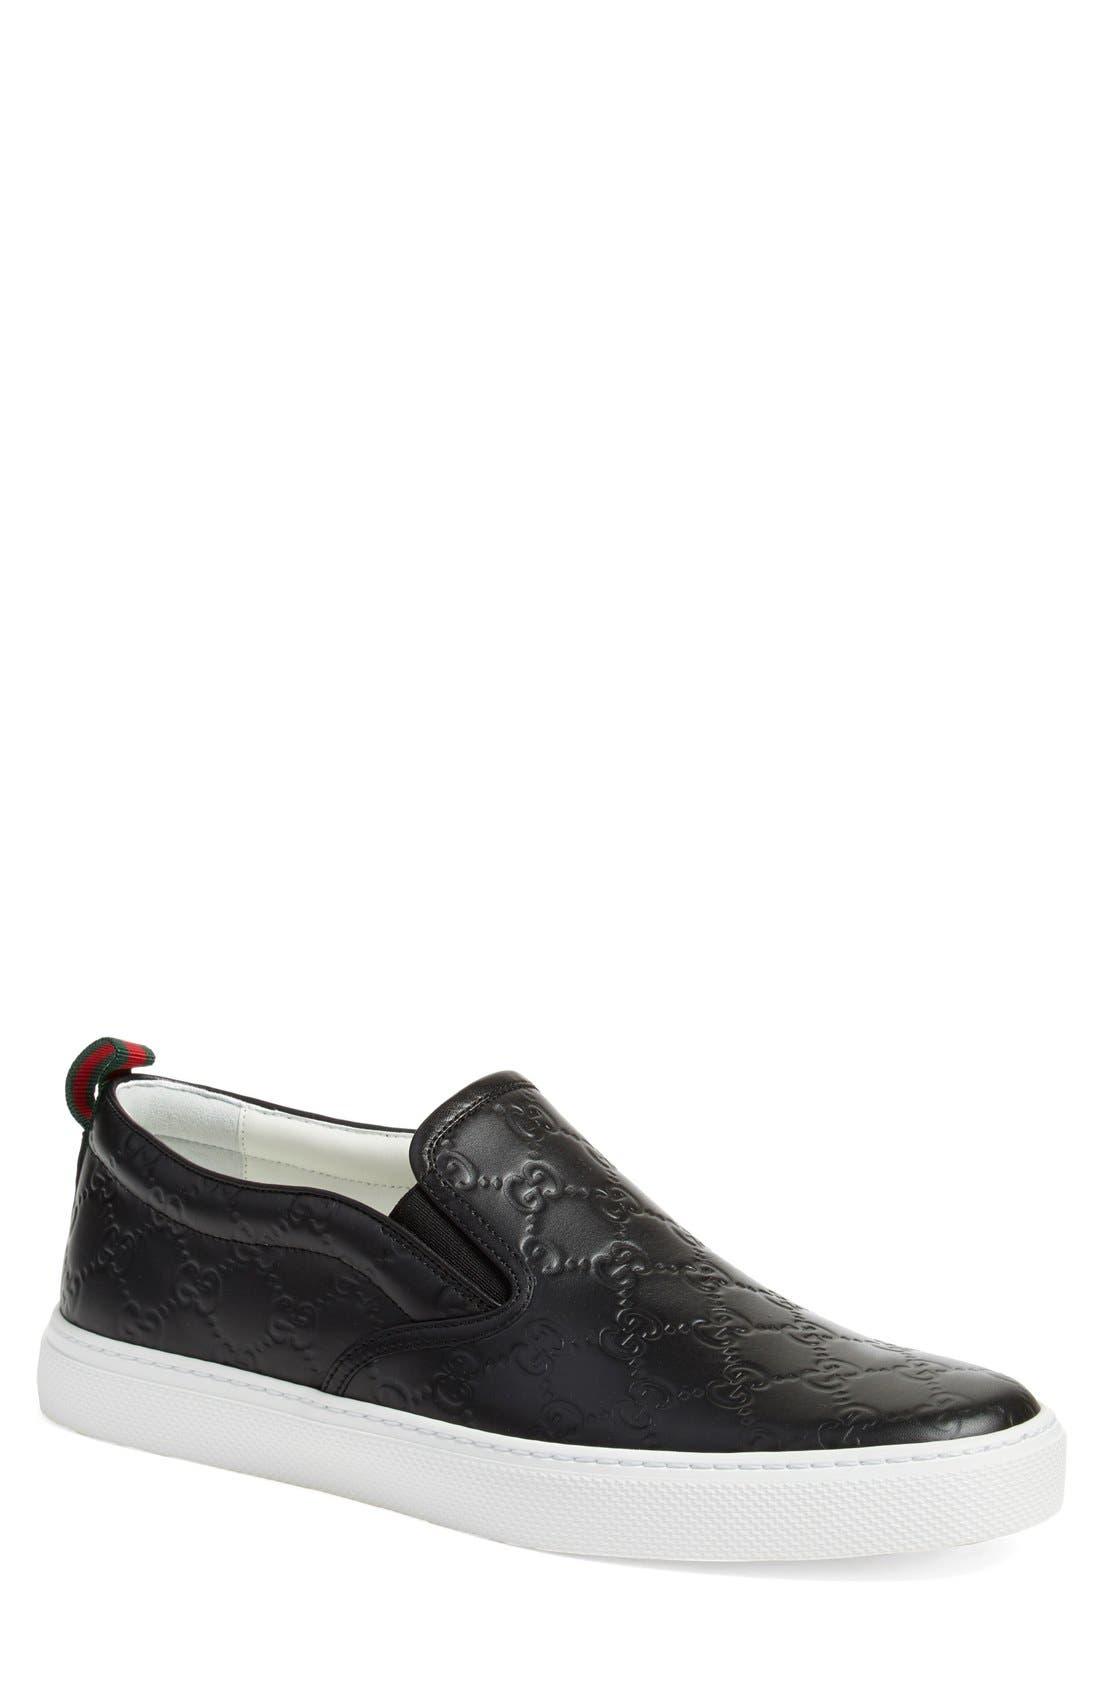 GUCCI Dublin Slip-On Sneaker